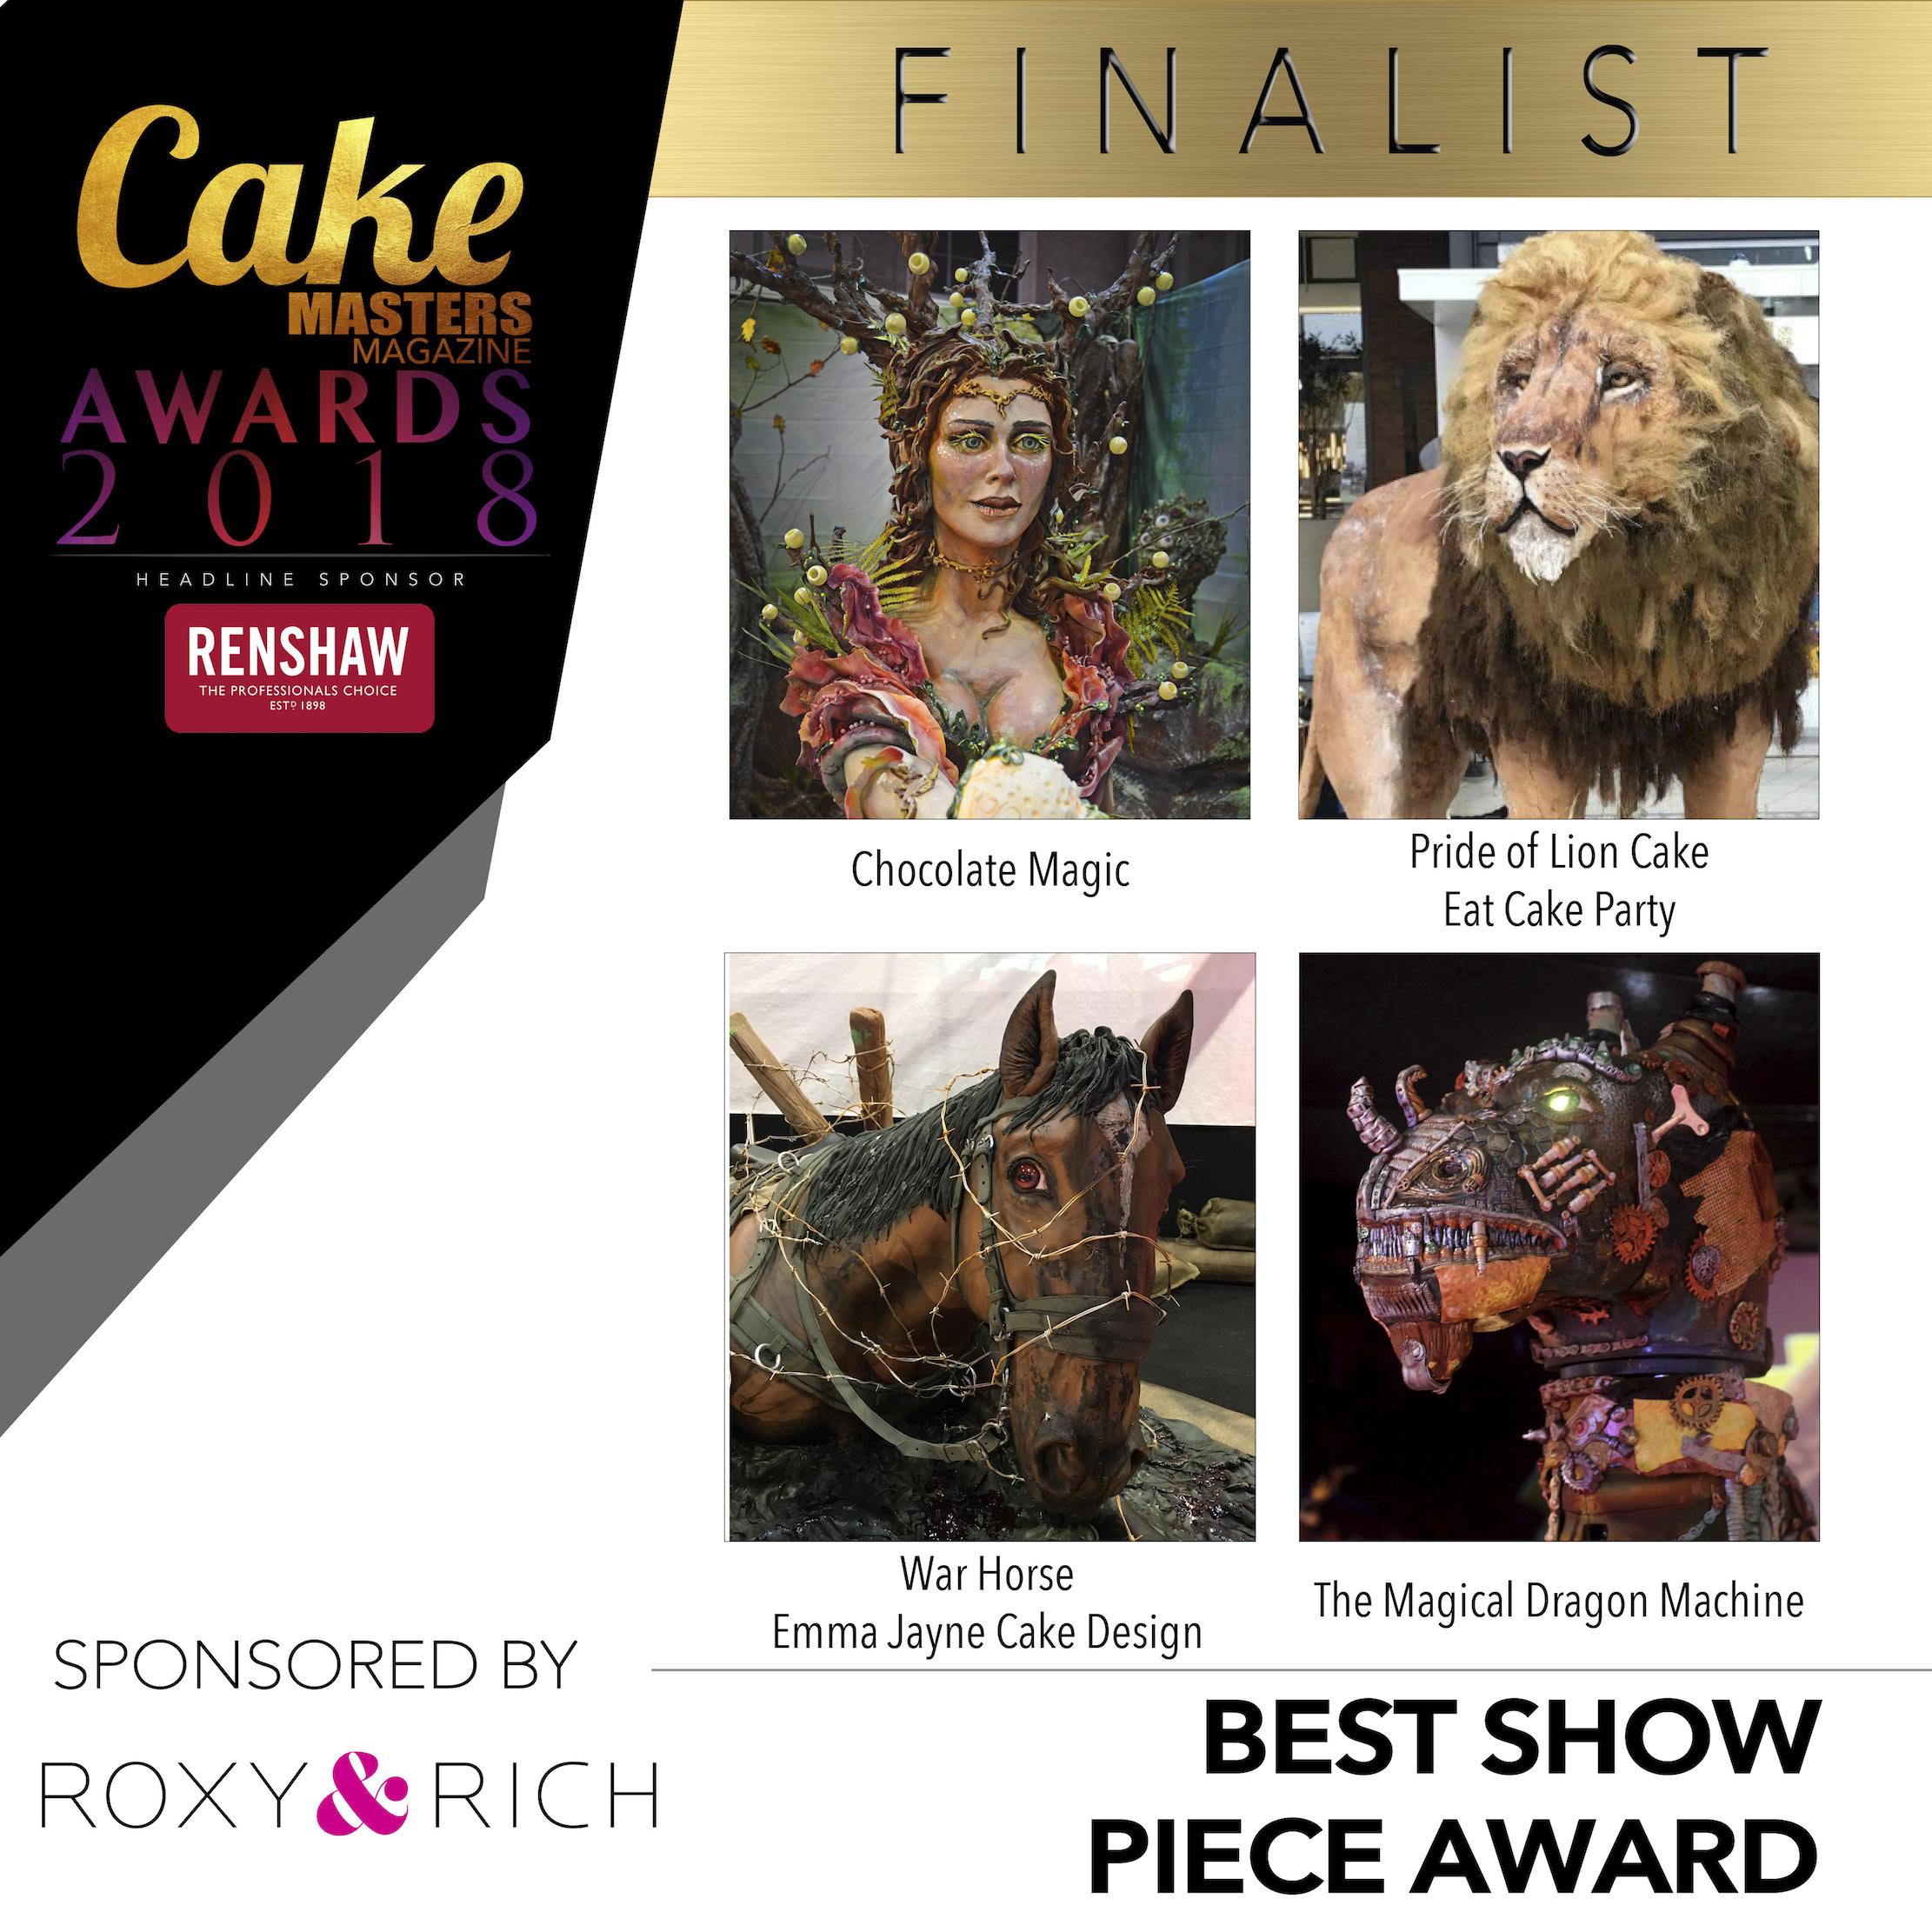 Finalist Grid 2018 BEST SHOW PIECE AWARD SPONSORED BY ROXY & RICH.jpg